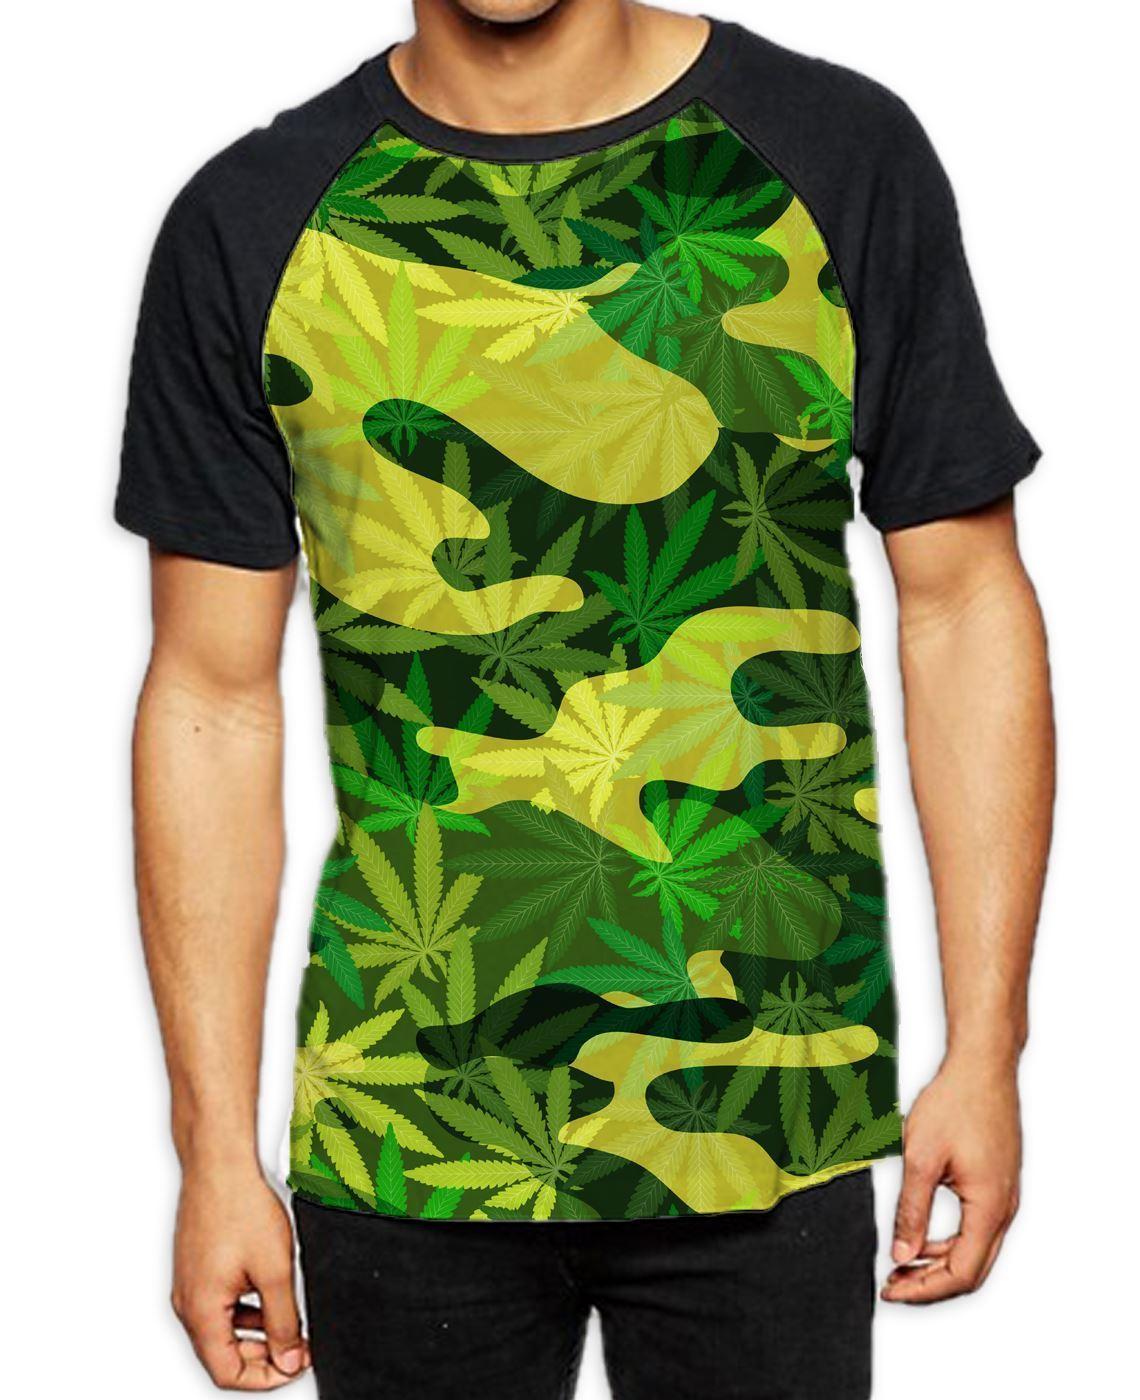 Camouflage Cannabis Leaves Men's All Over Baseball T Shirt - Stoner Marijuana 1